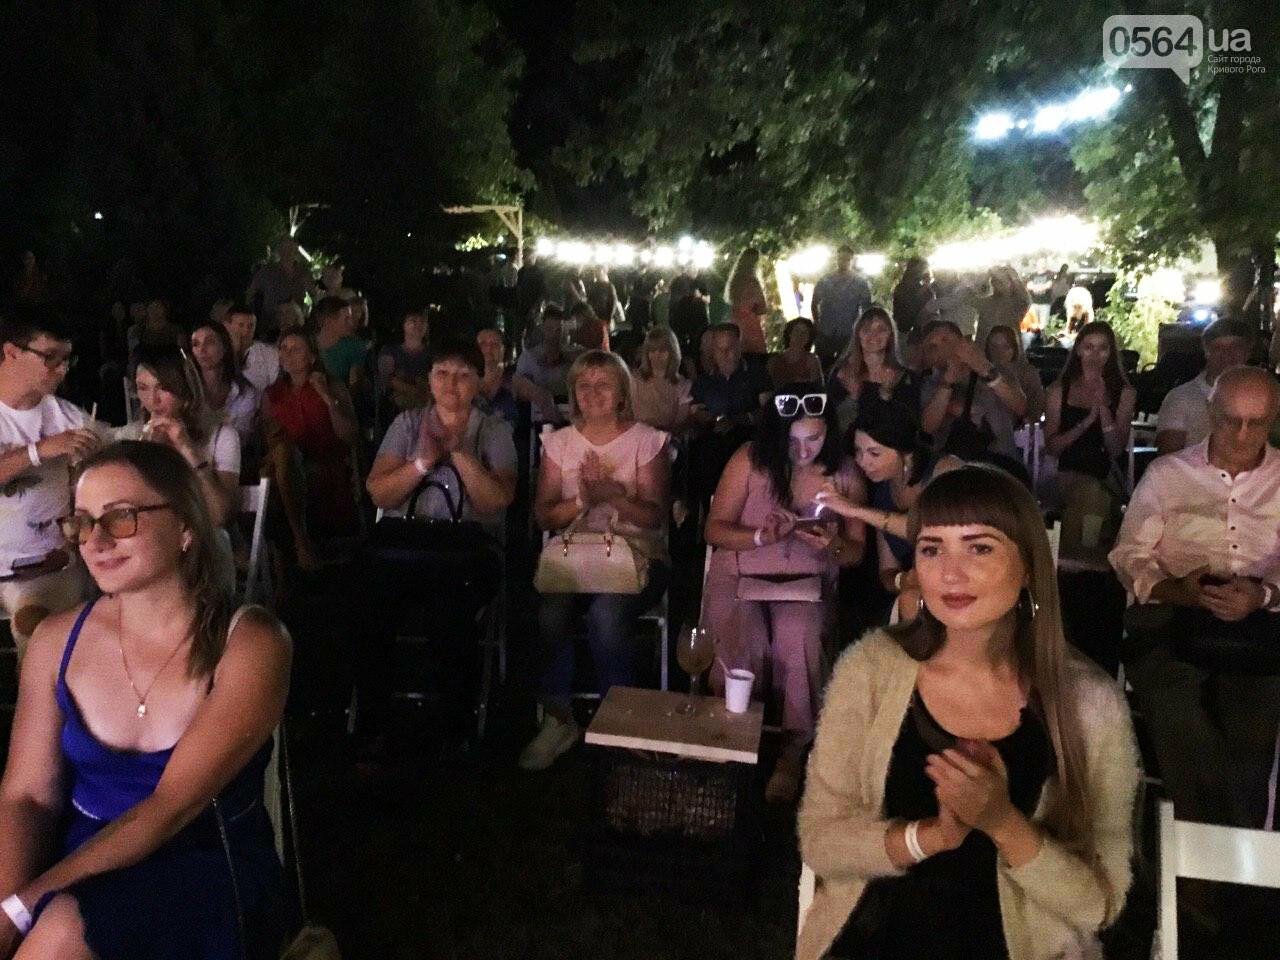 Под звездным небом криворожане наслаждались летним джазом от  Advantage Project, - ФОТО, ВИДЕО , фото-6